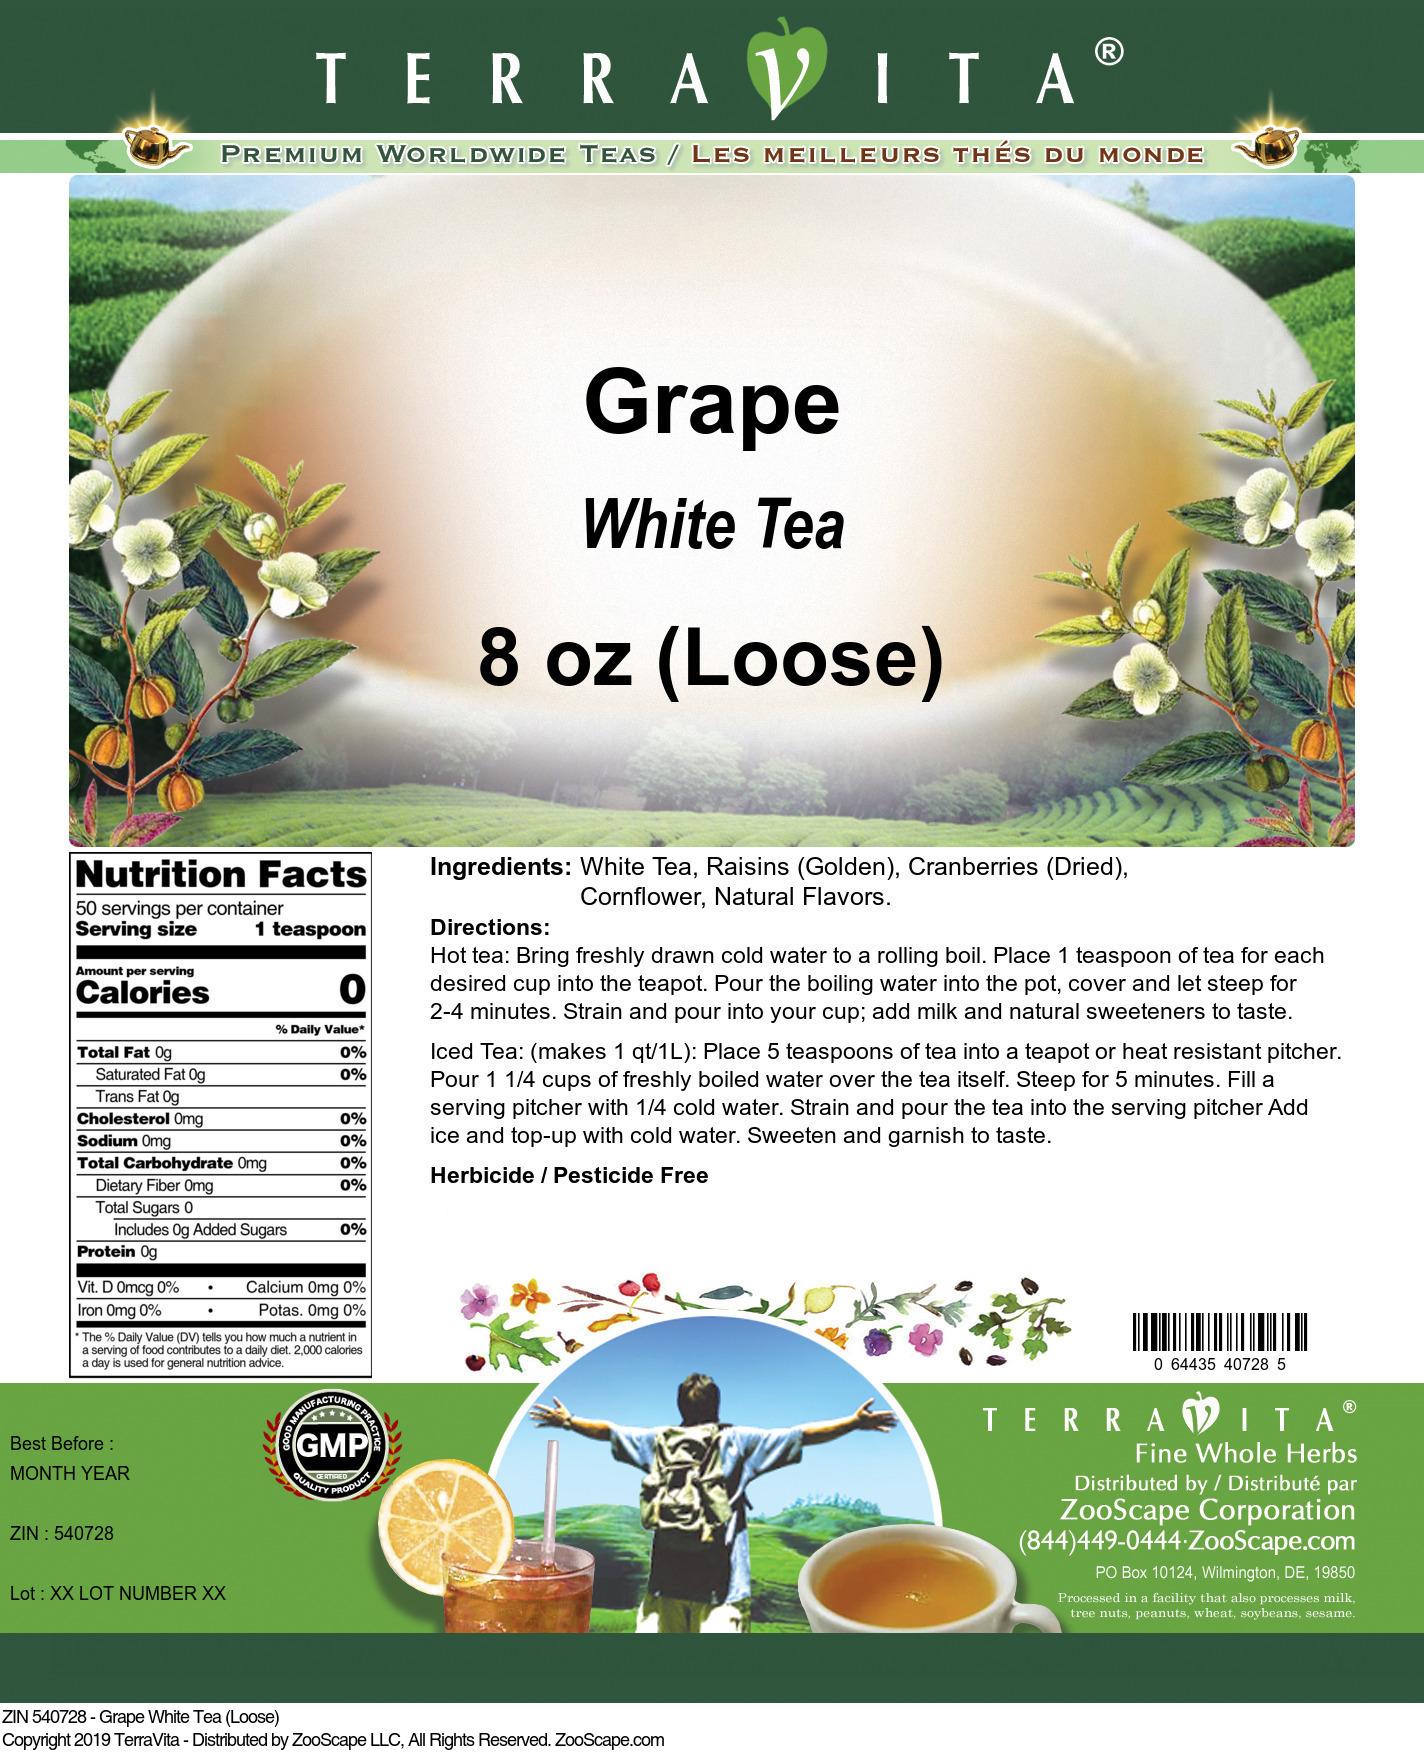 Grape White Tea (Loose)